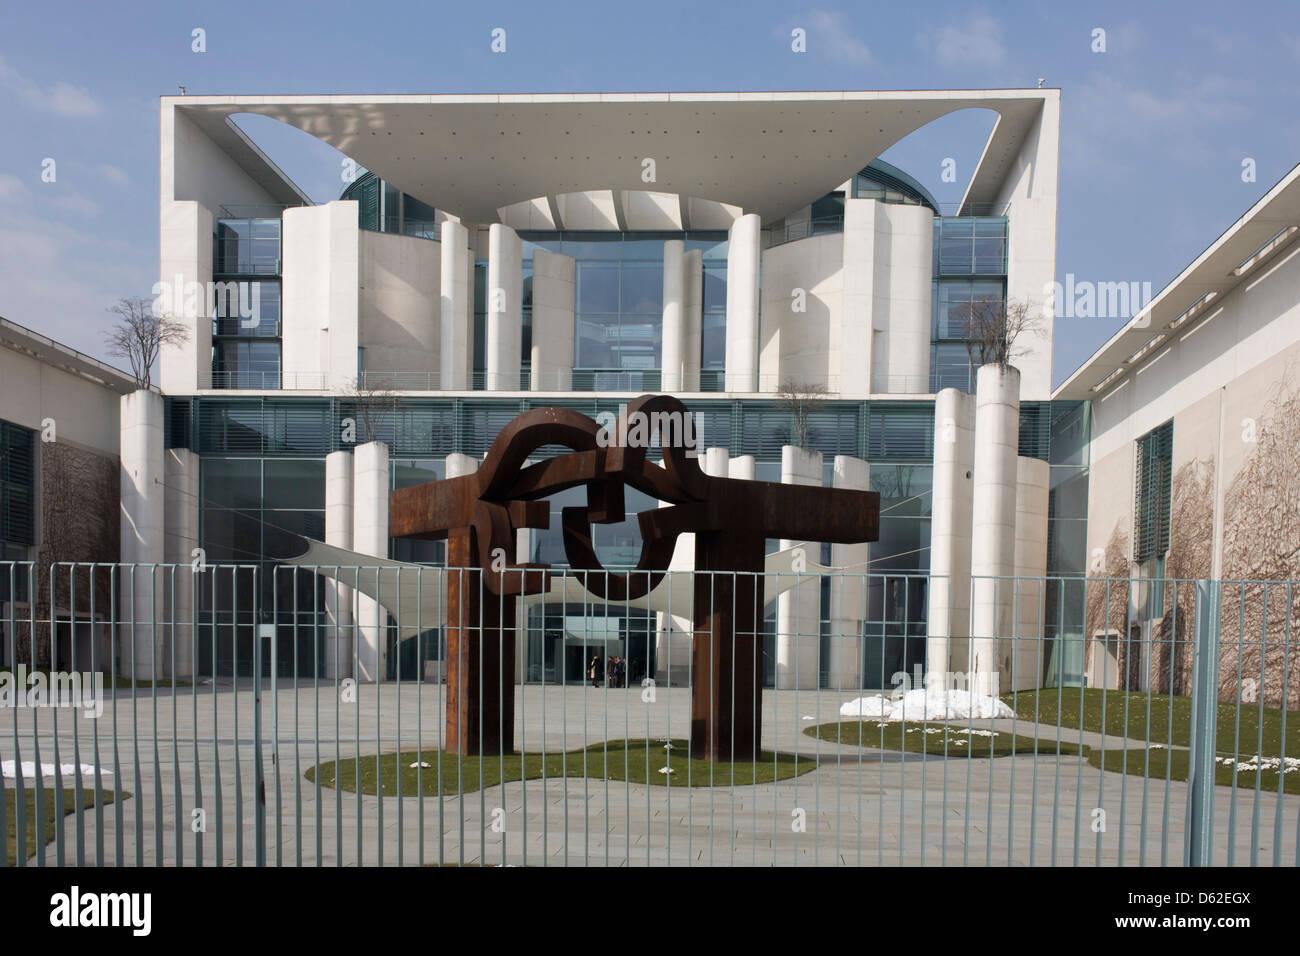 Exterior of the German Chancellery (Bundeskanzleramt) on Paul-Loeb-Allee, Berlin Stock Photo